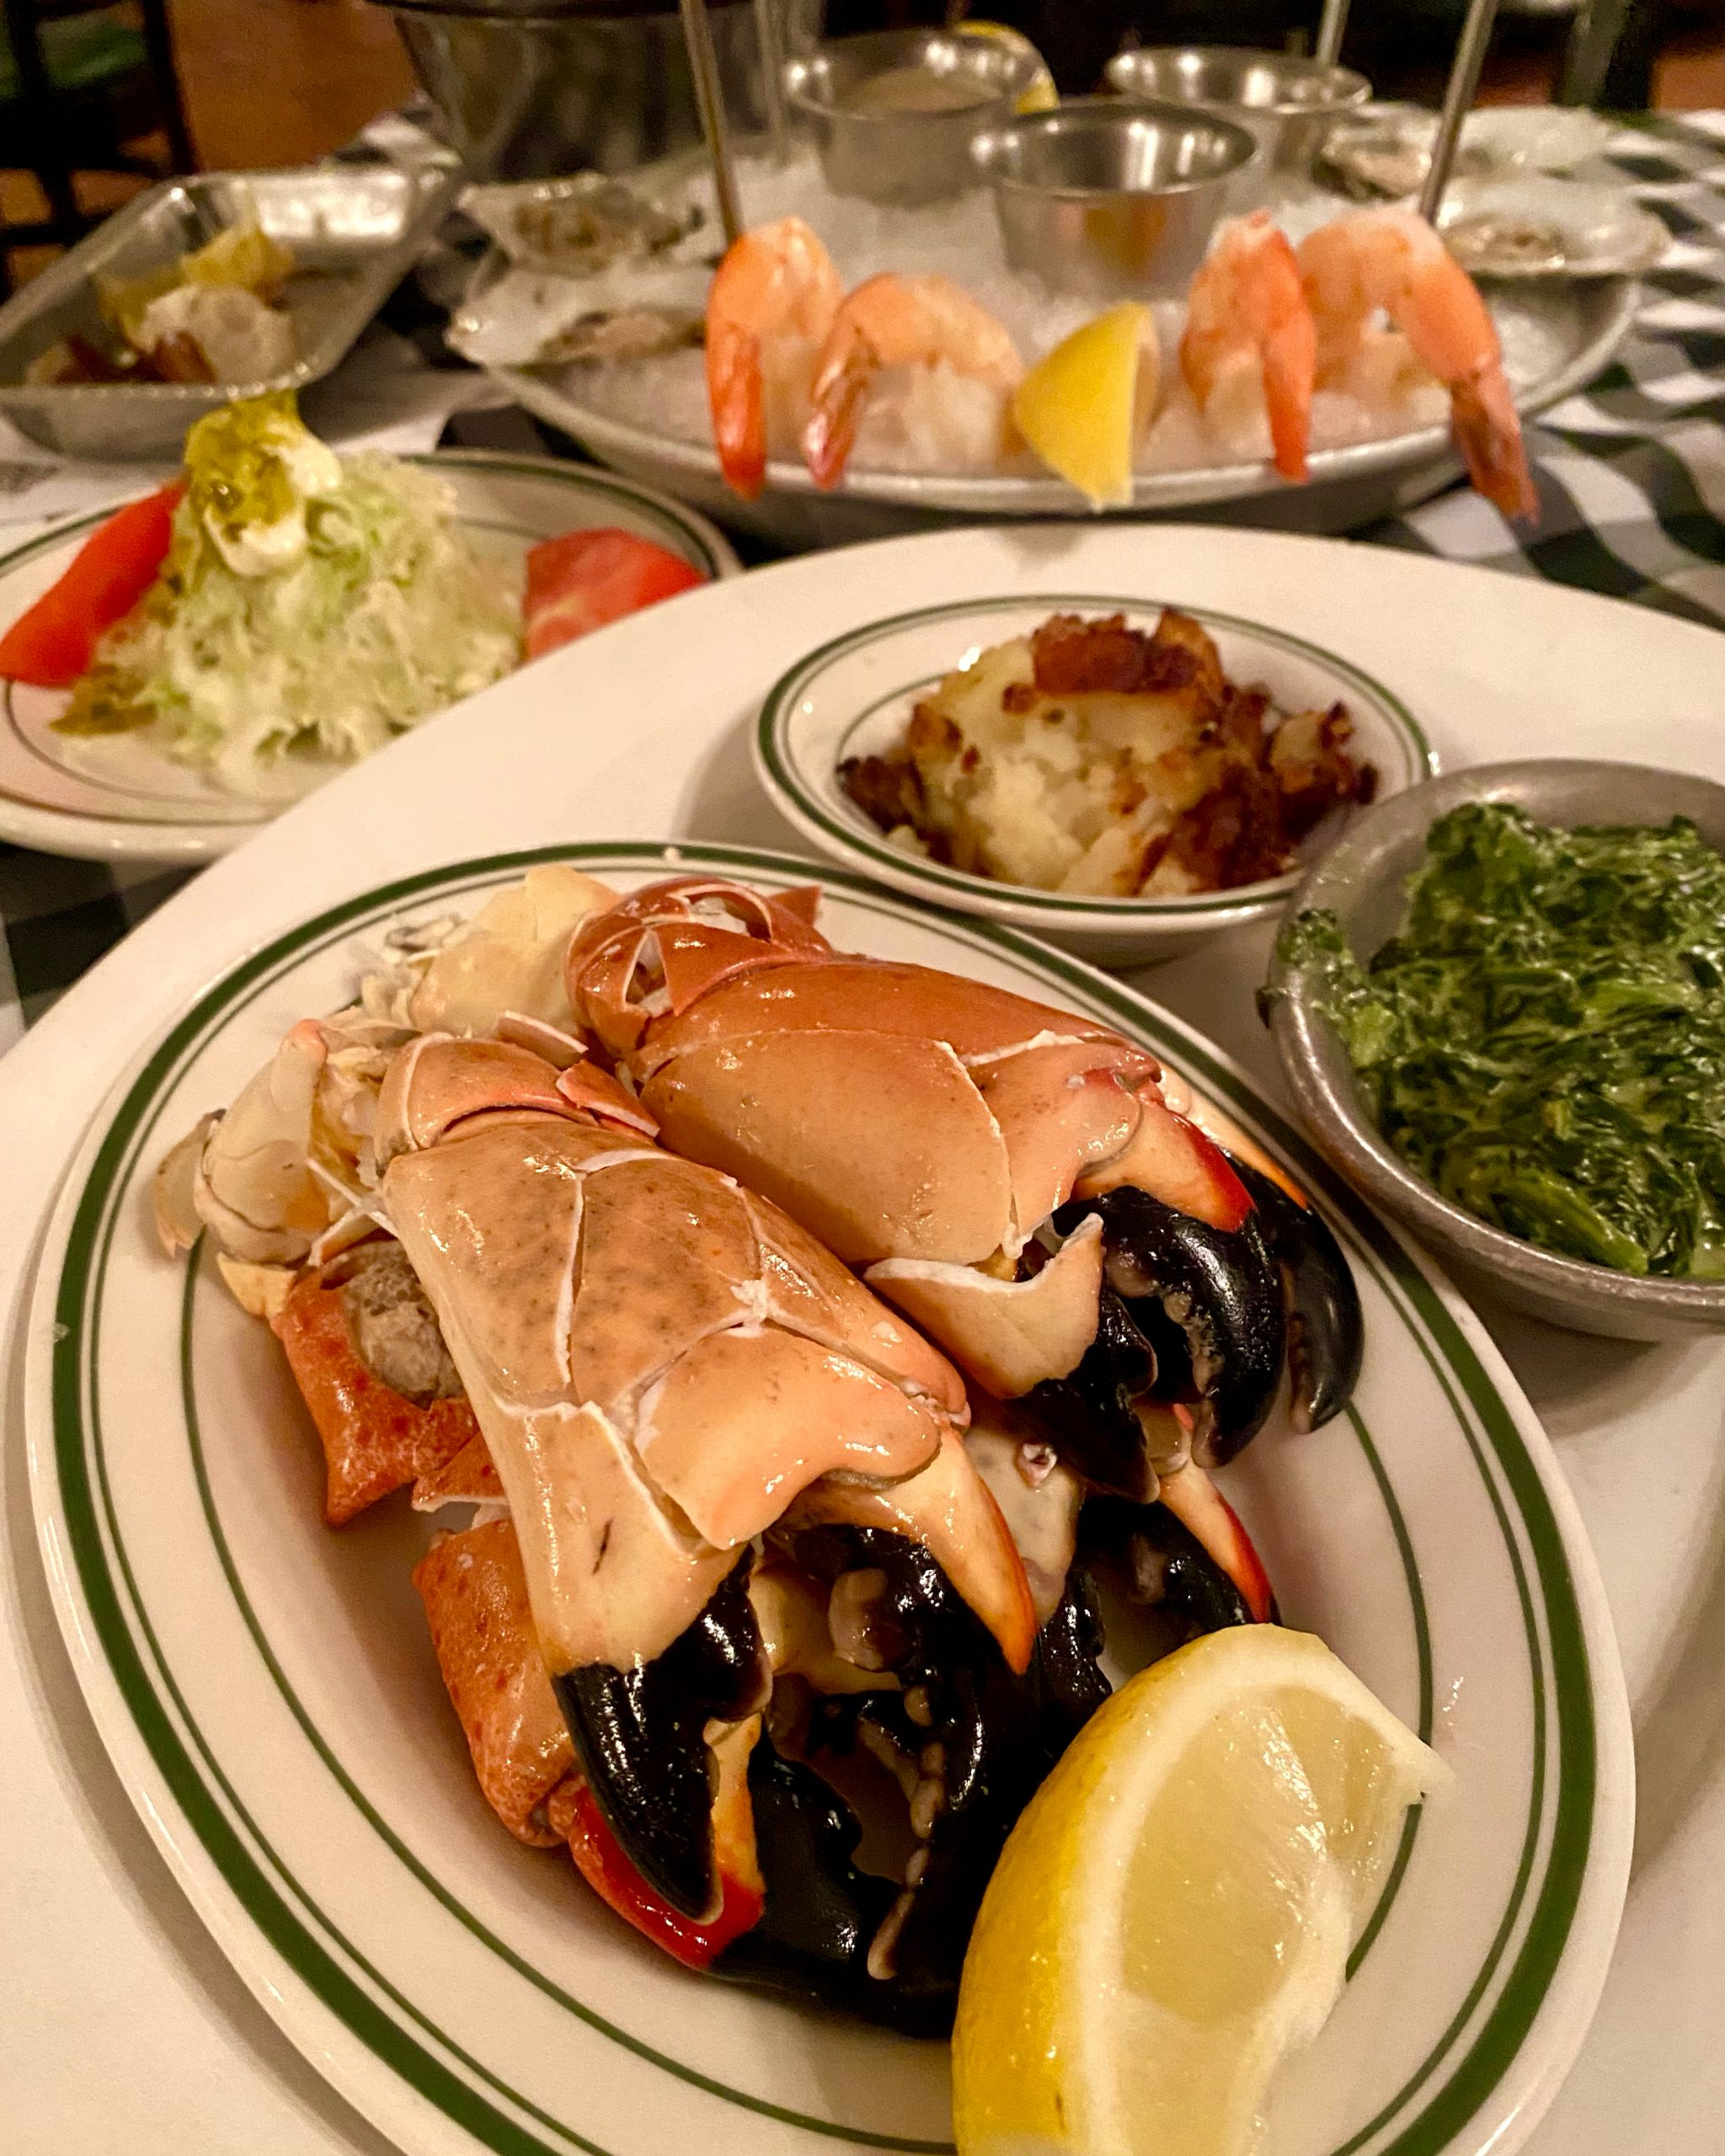 Stone crabs from Joe's Stone Crab